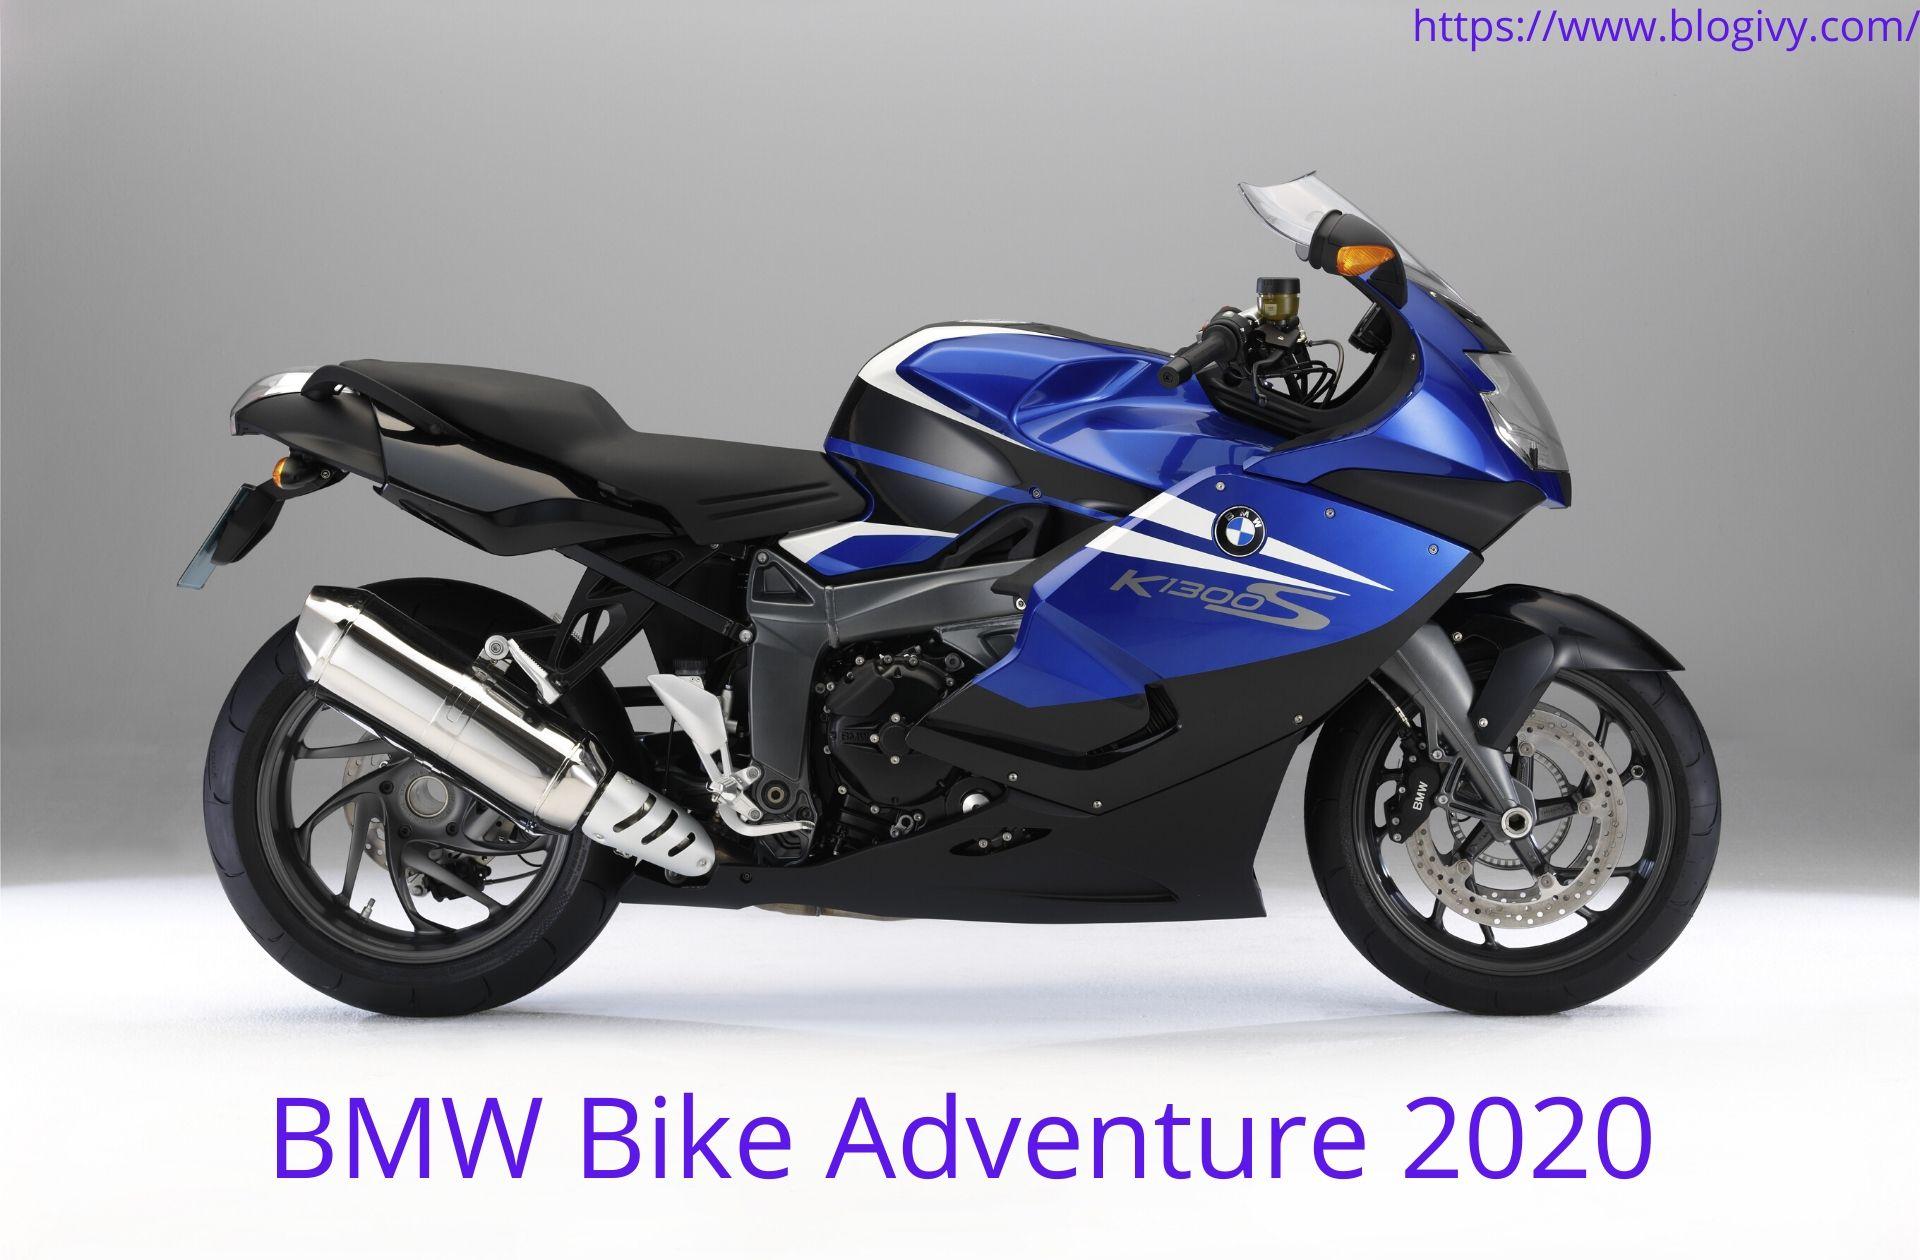 BMW Bike Adventure 2020